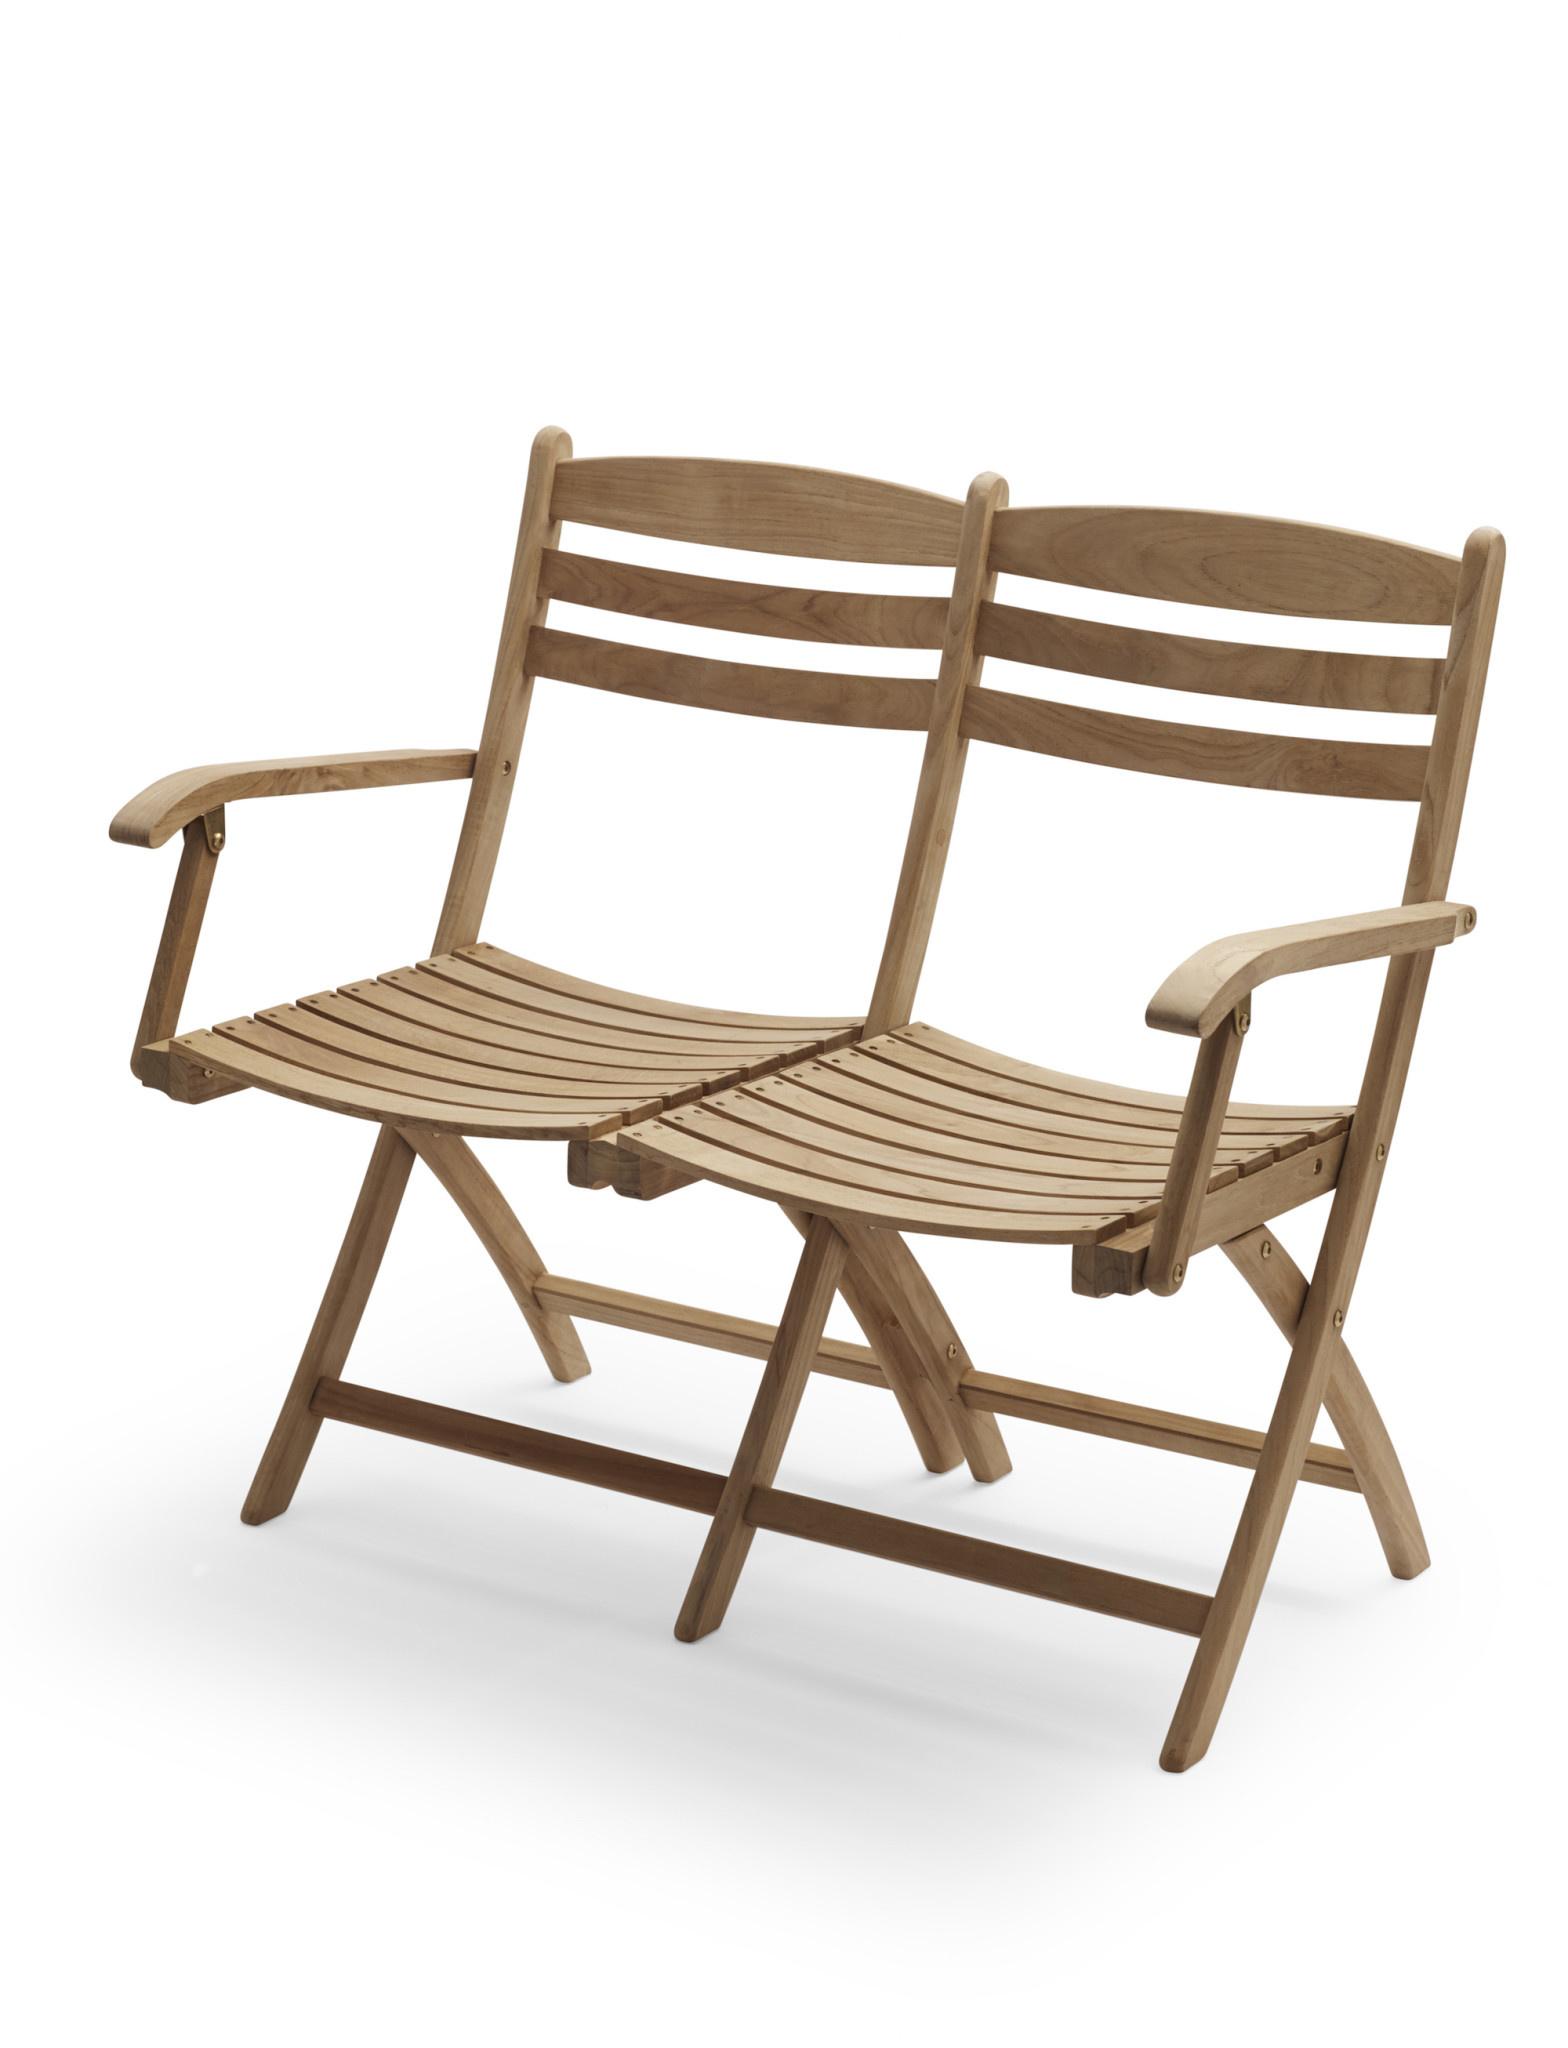 Skagerak Selandia Two Seater Bench - Teak